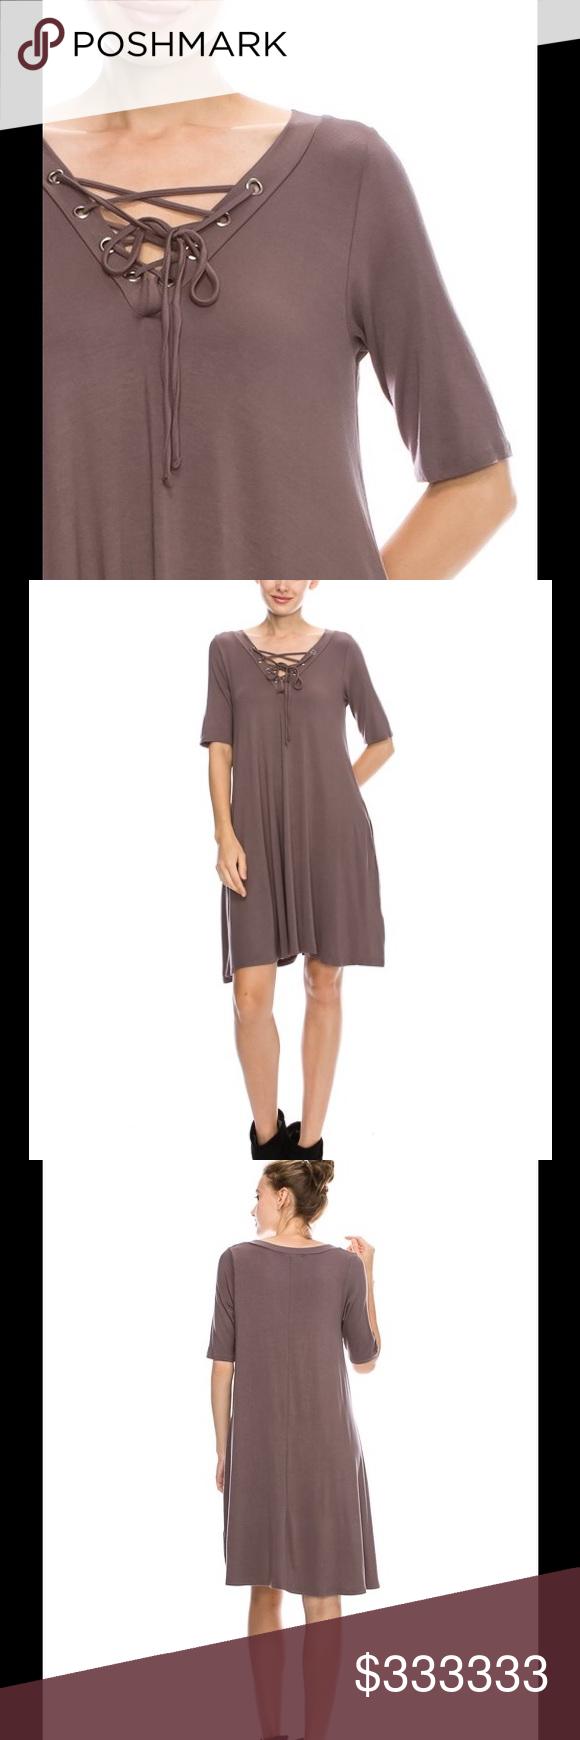 fbdf5a43c318 濾Lace up dress mocha ❤️has pockets Boutique